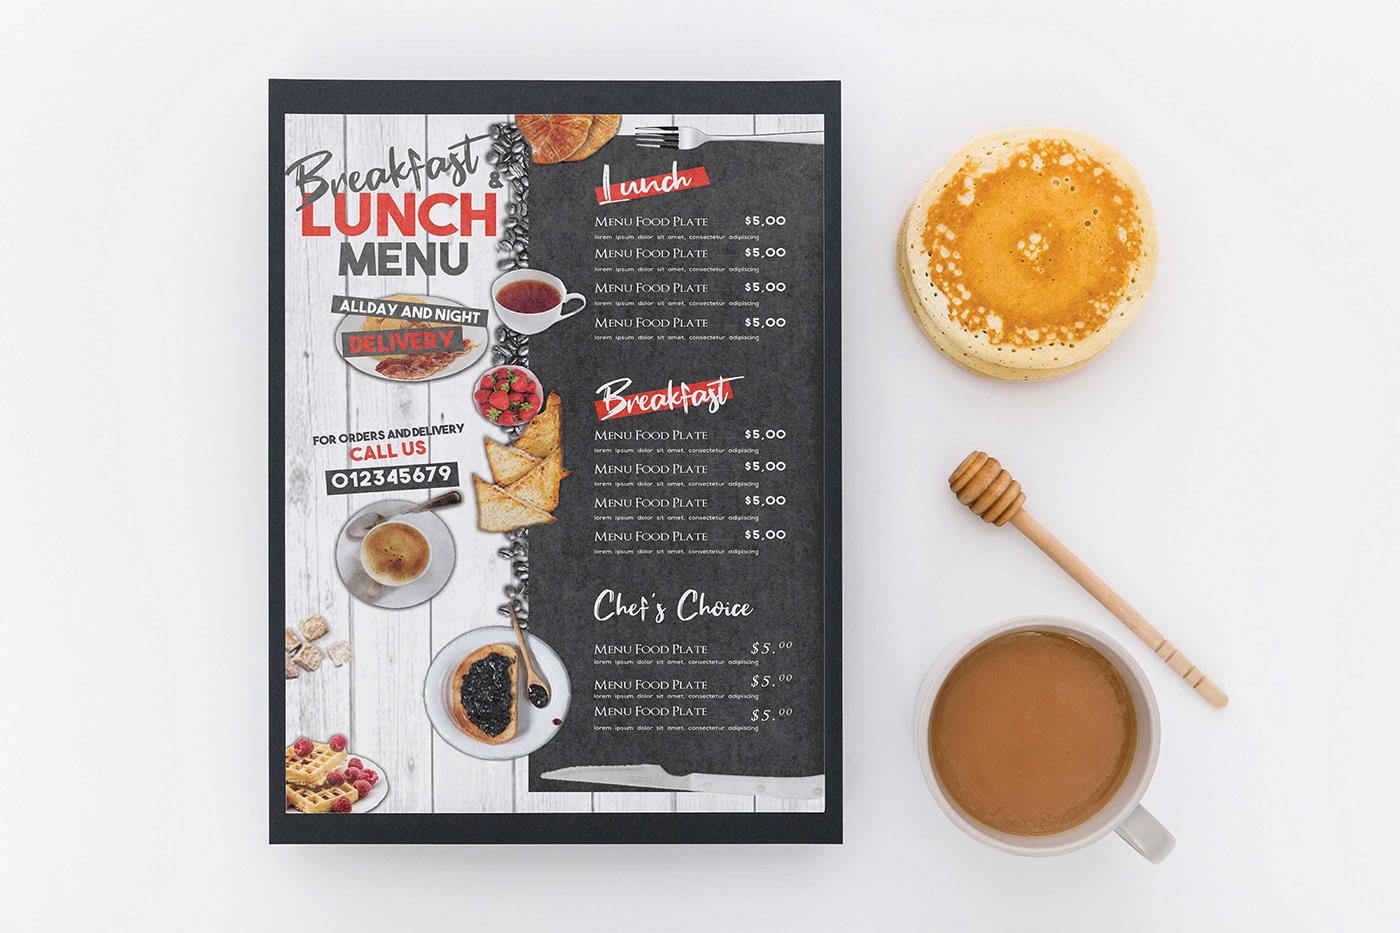 Image may contain: indoor, food and menu